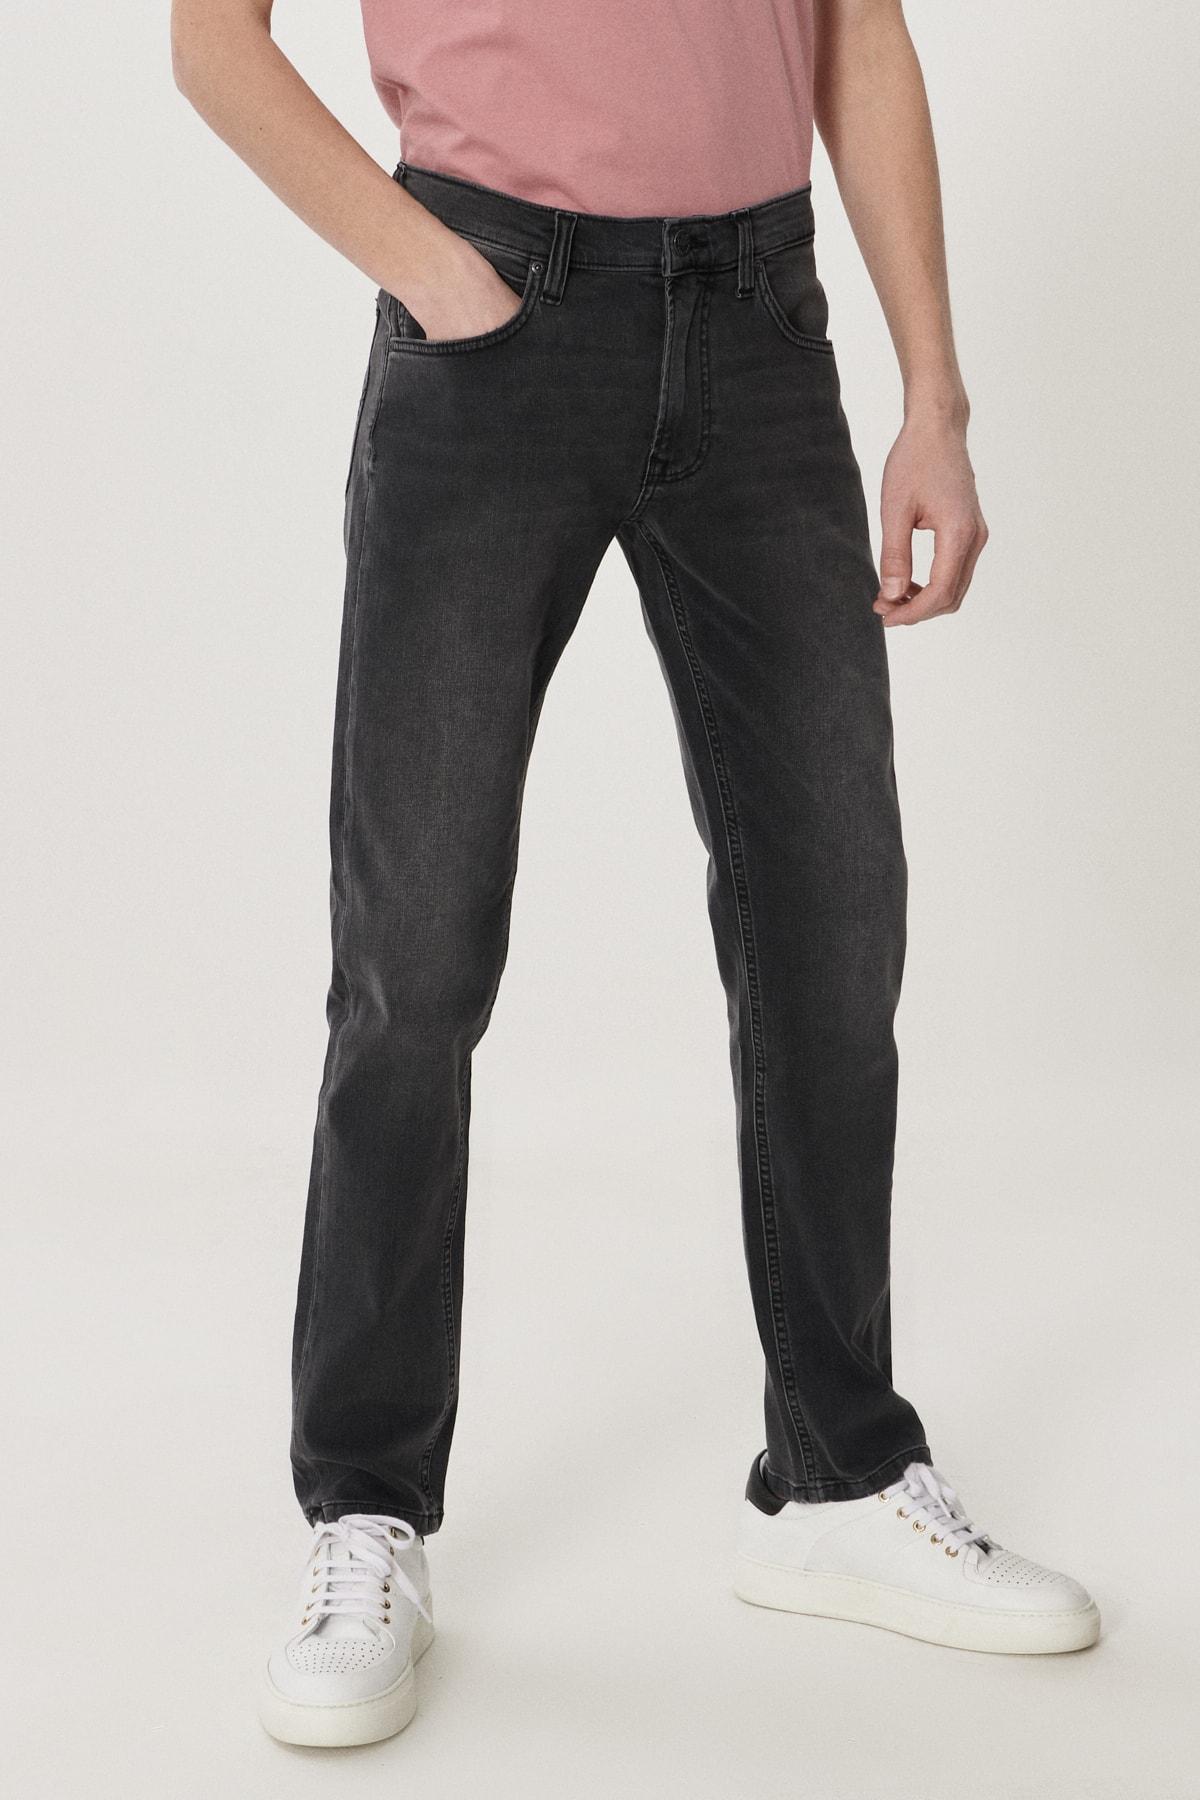 Lee Daren Erkek Siyah Straight Fit Normal Bel Düz Paça Esnek Jean Pantolon